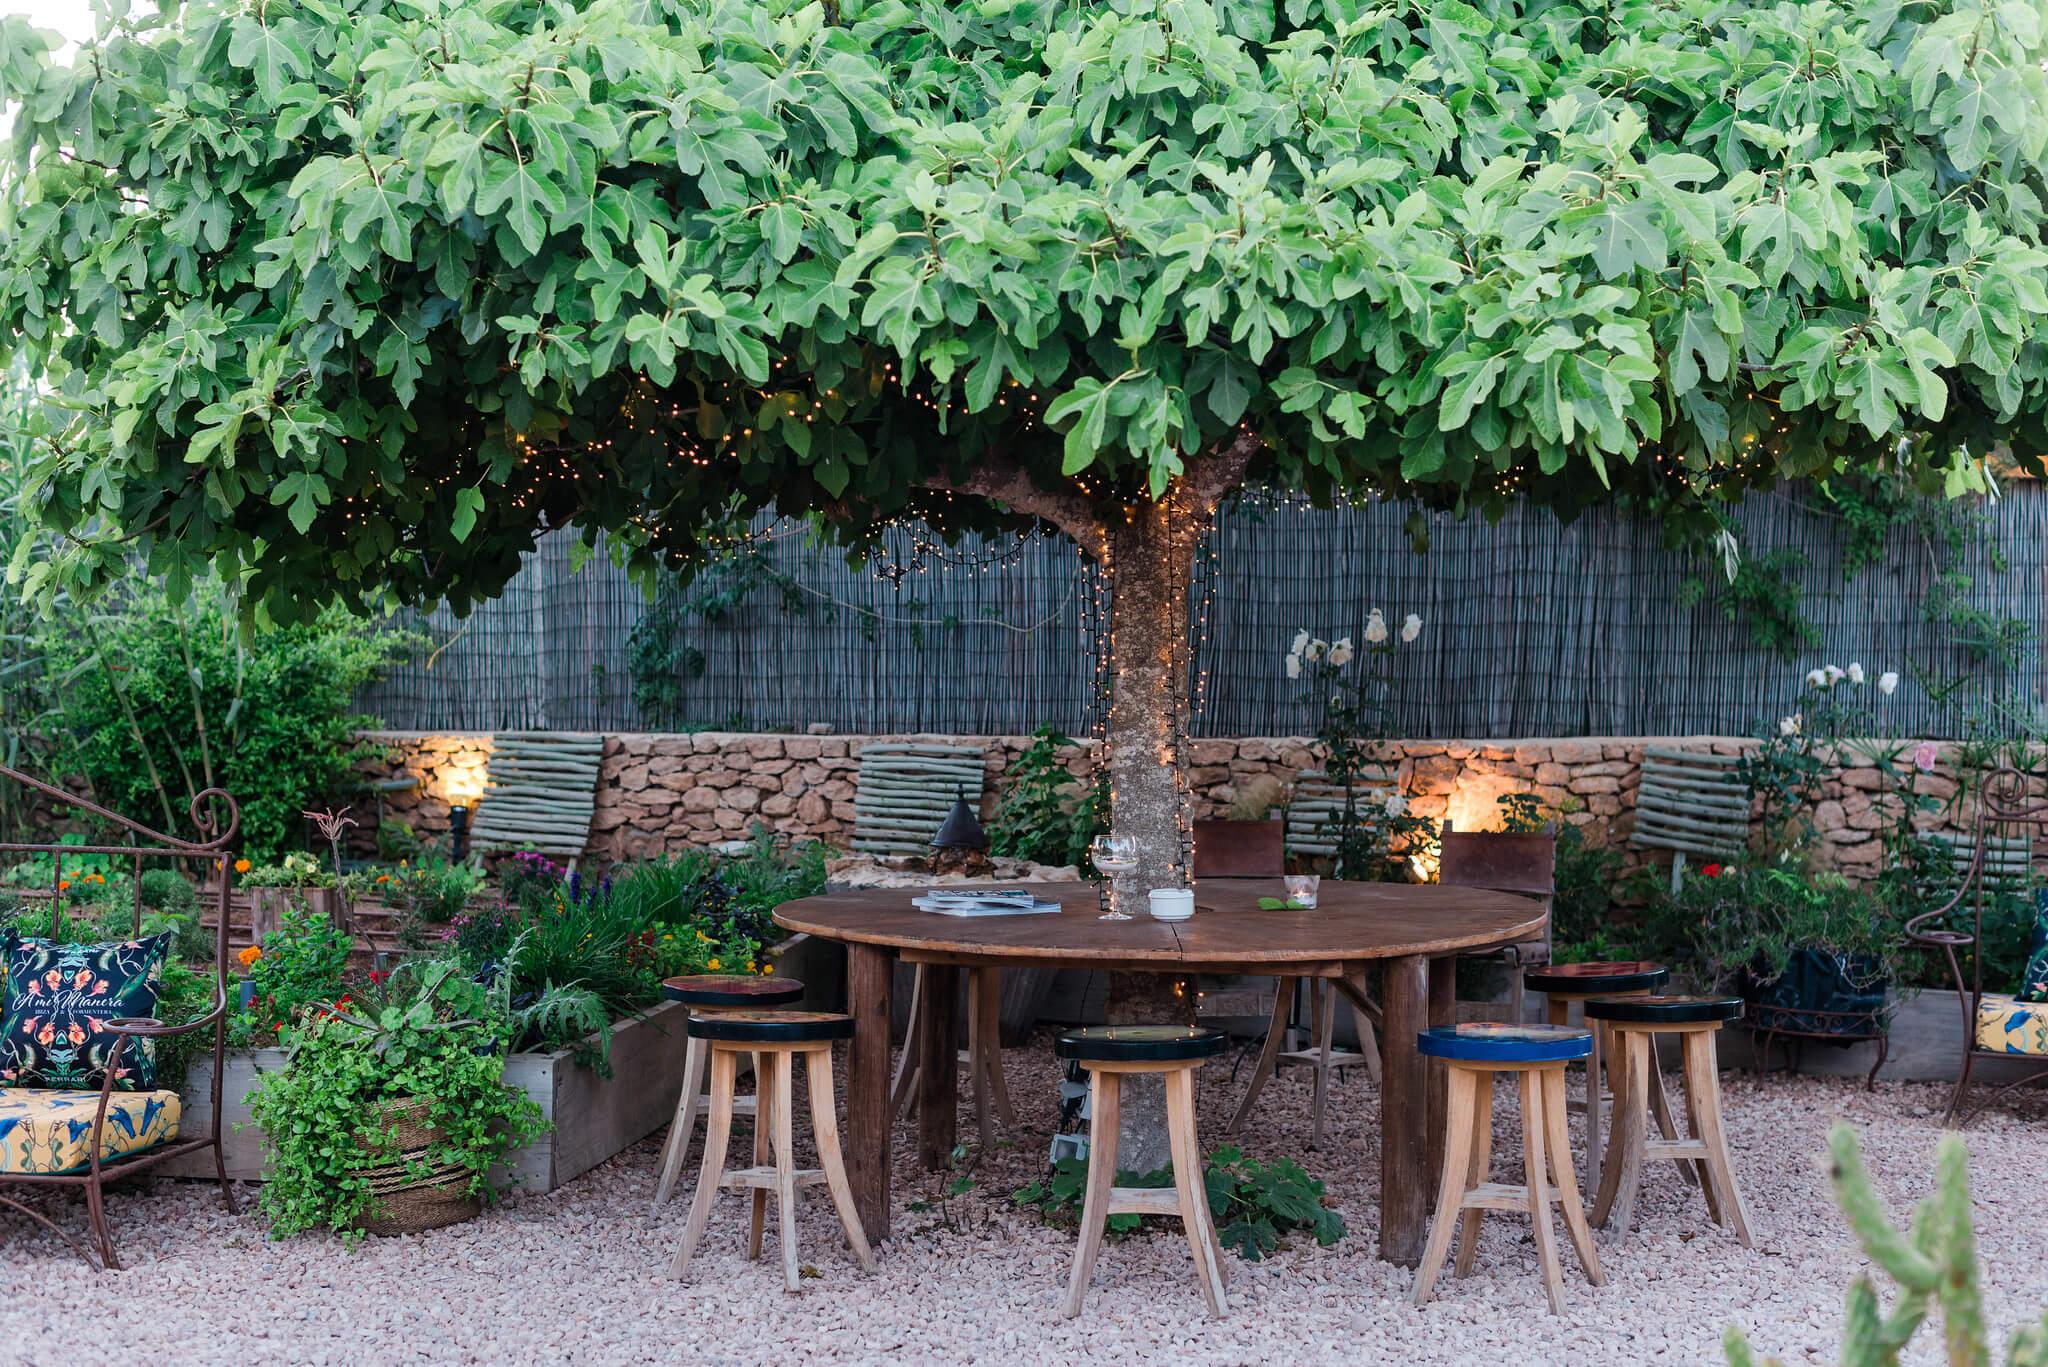 https://www.white-ibiza.com/wp-content/uploads/2020/03/formentera-restaurants-a-mi-manera-2020-01.jpg